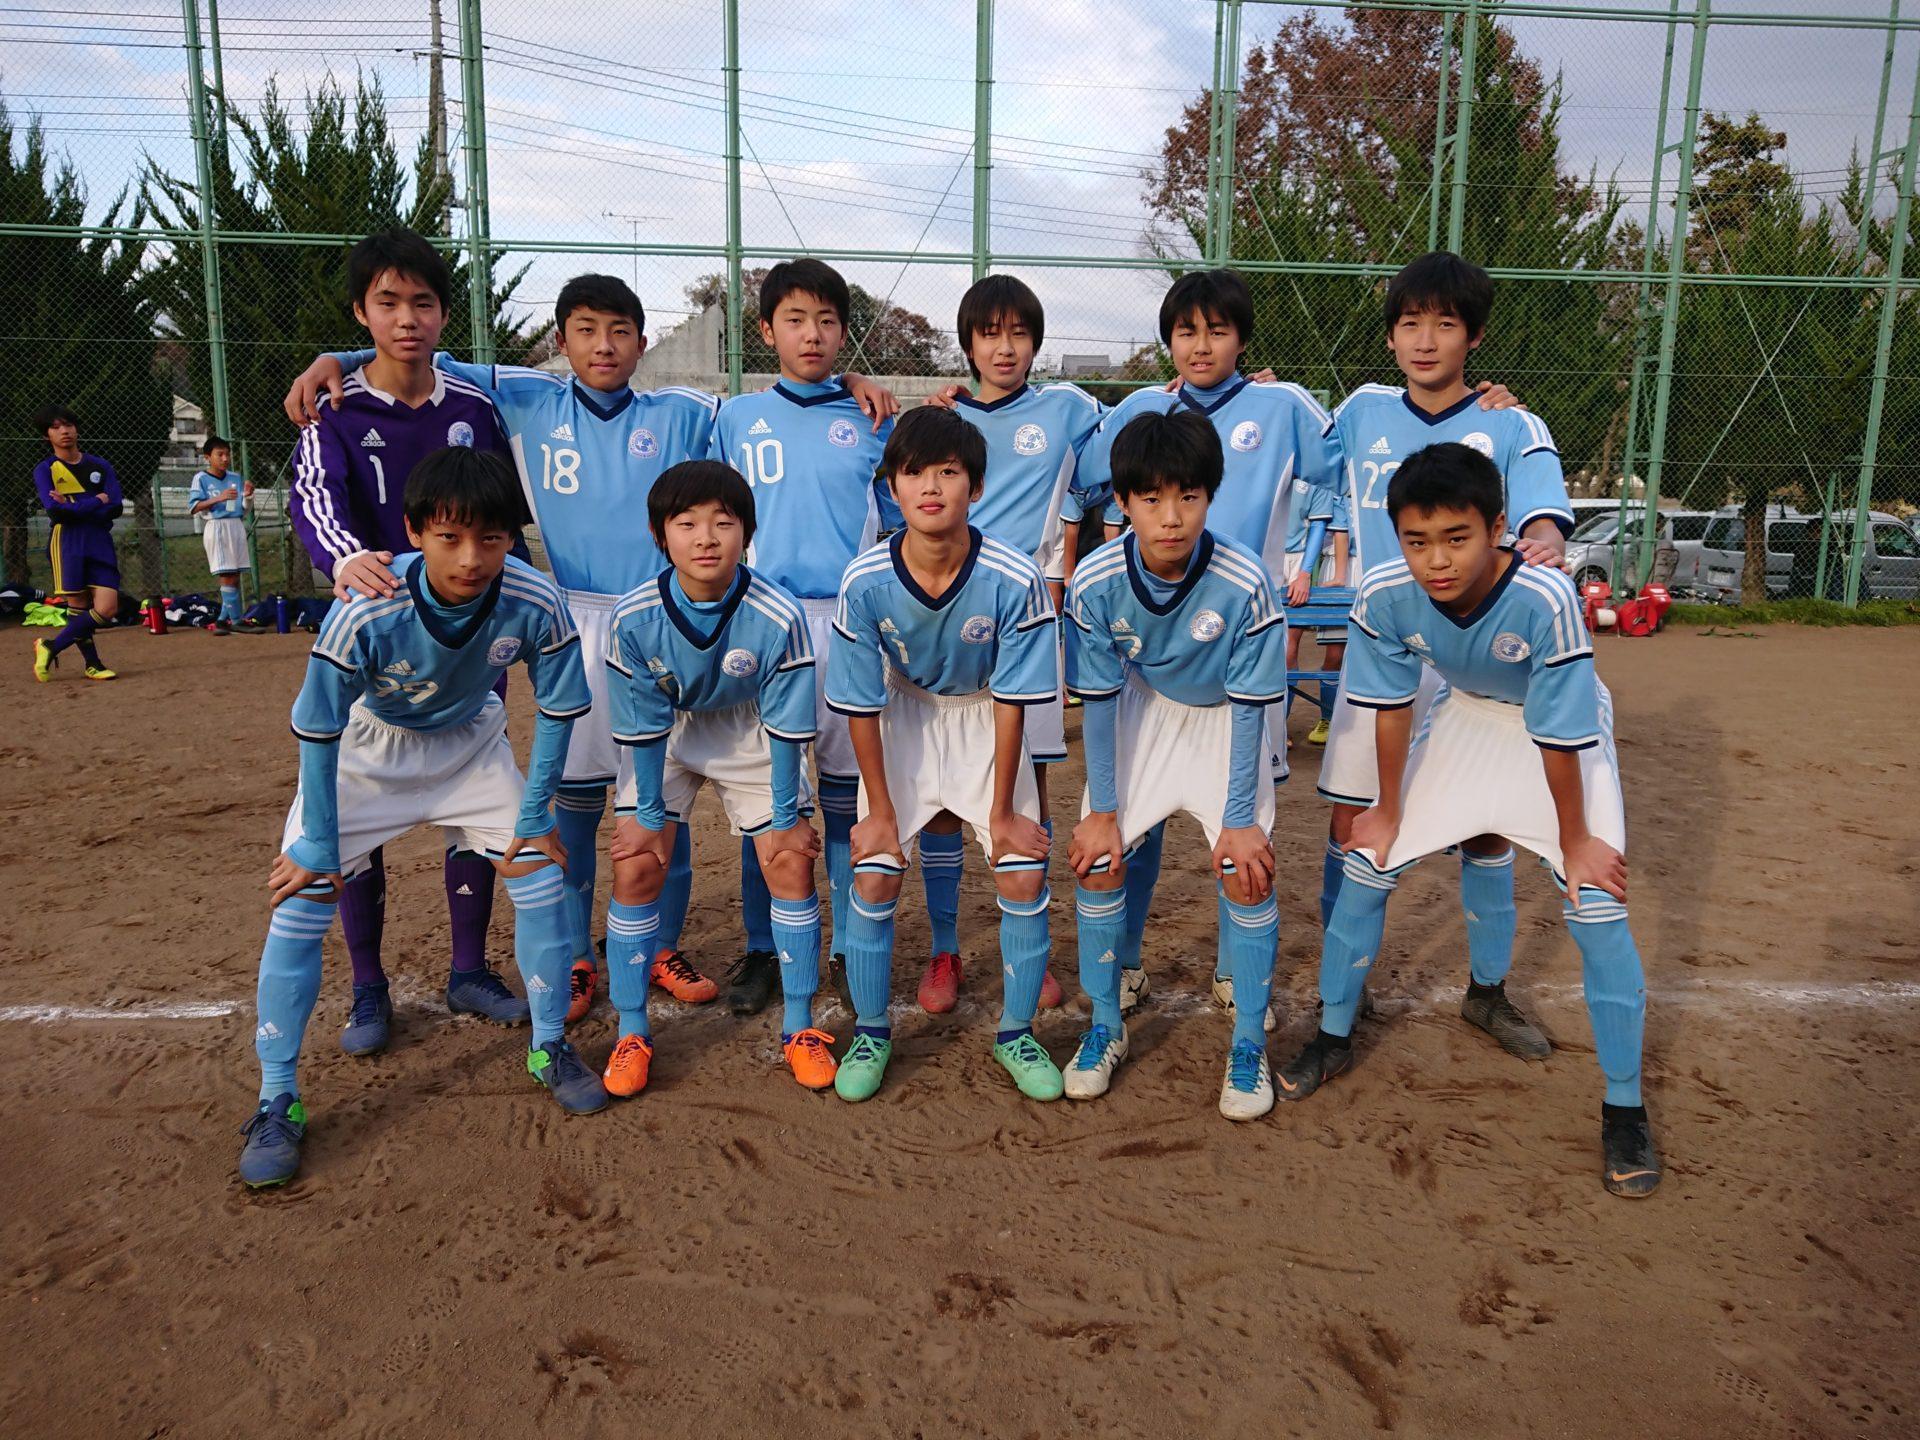 三多摩リーグU-13.14 vs ZION FOOTBALL CLUB